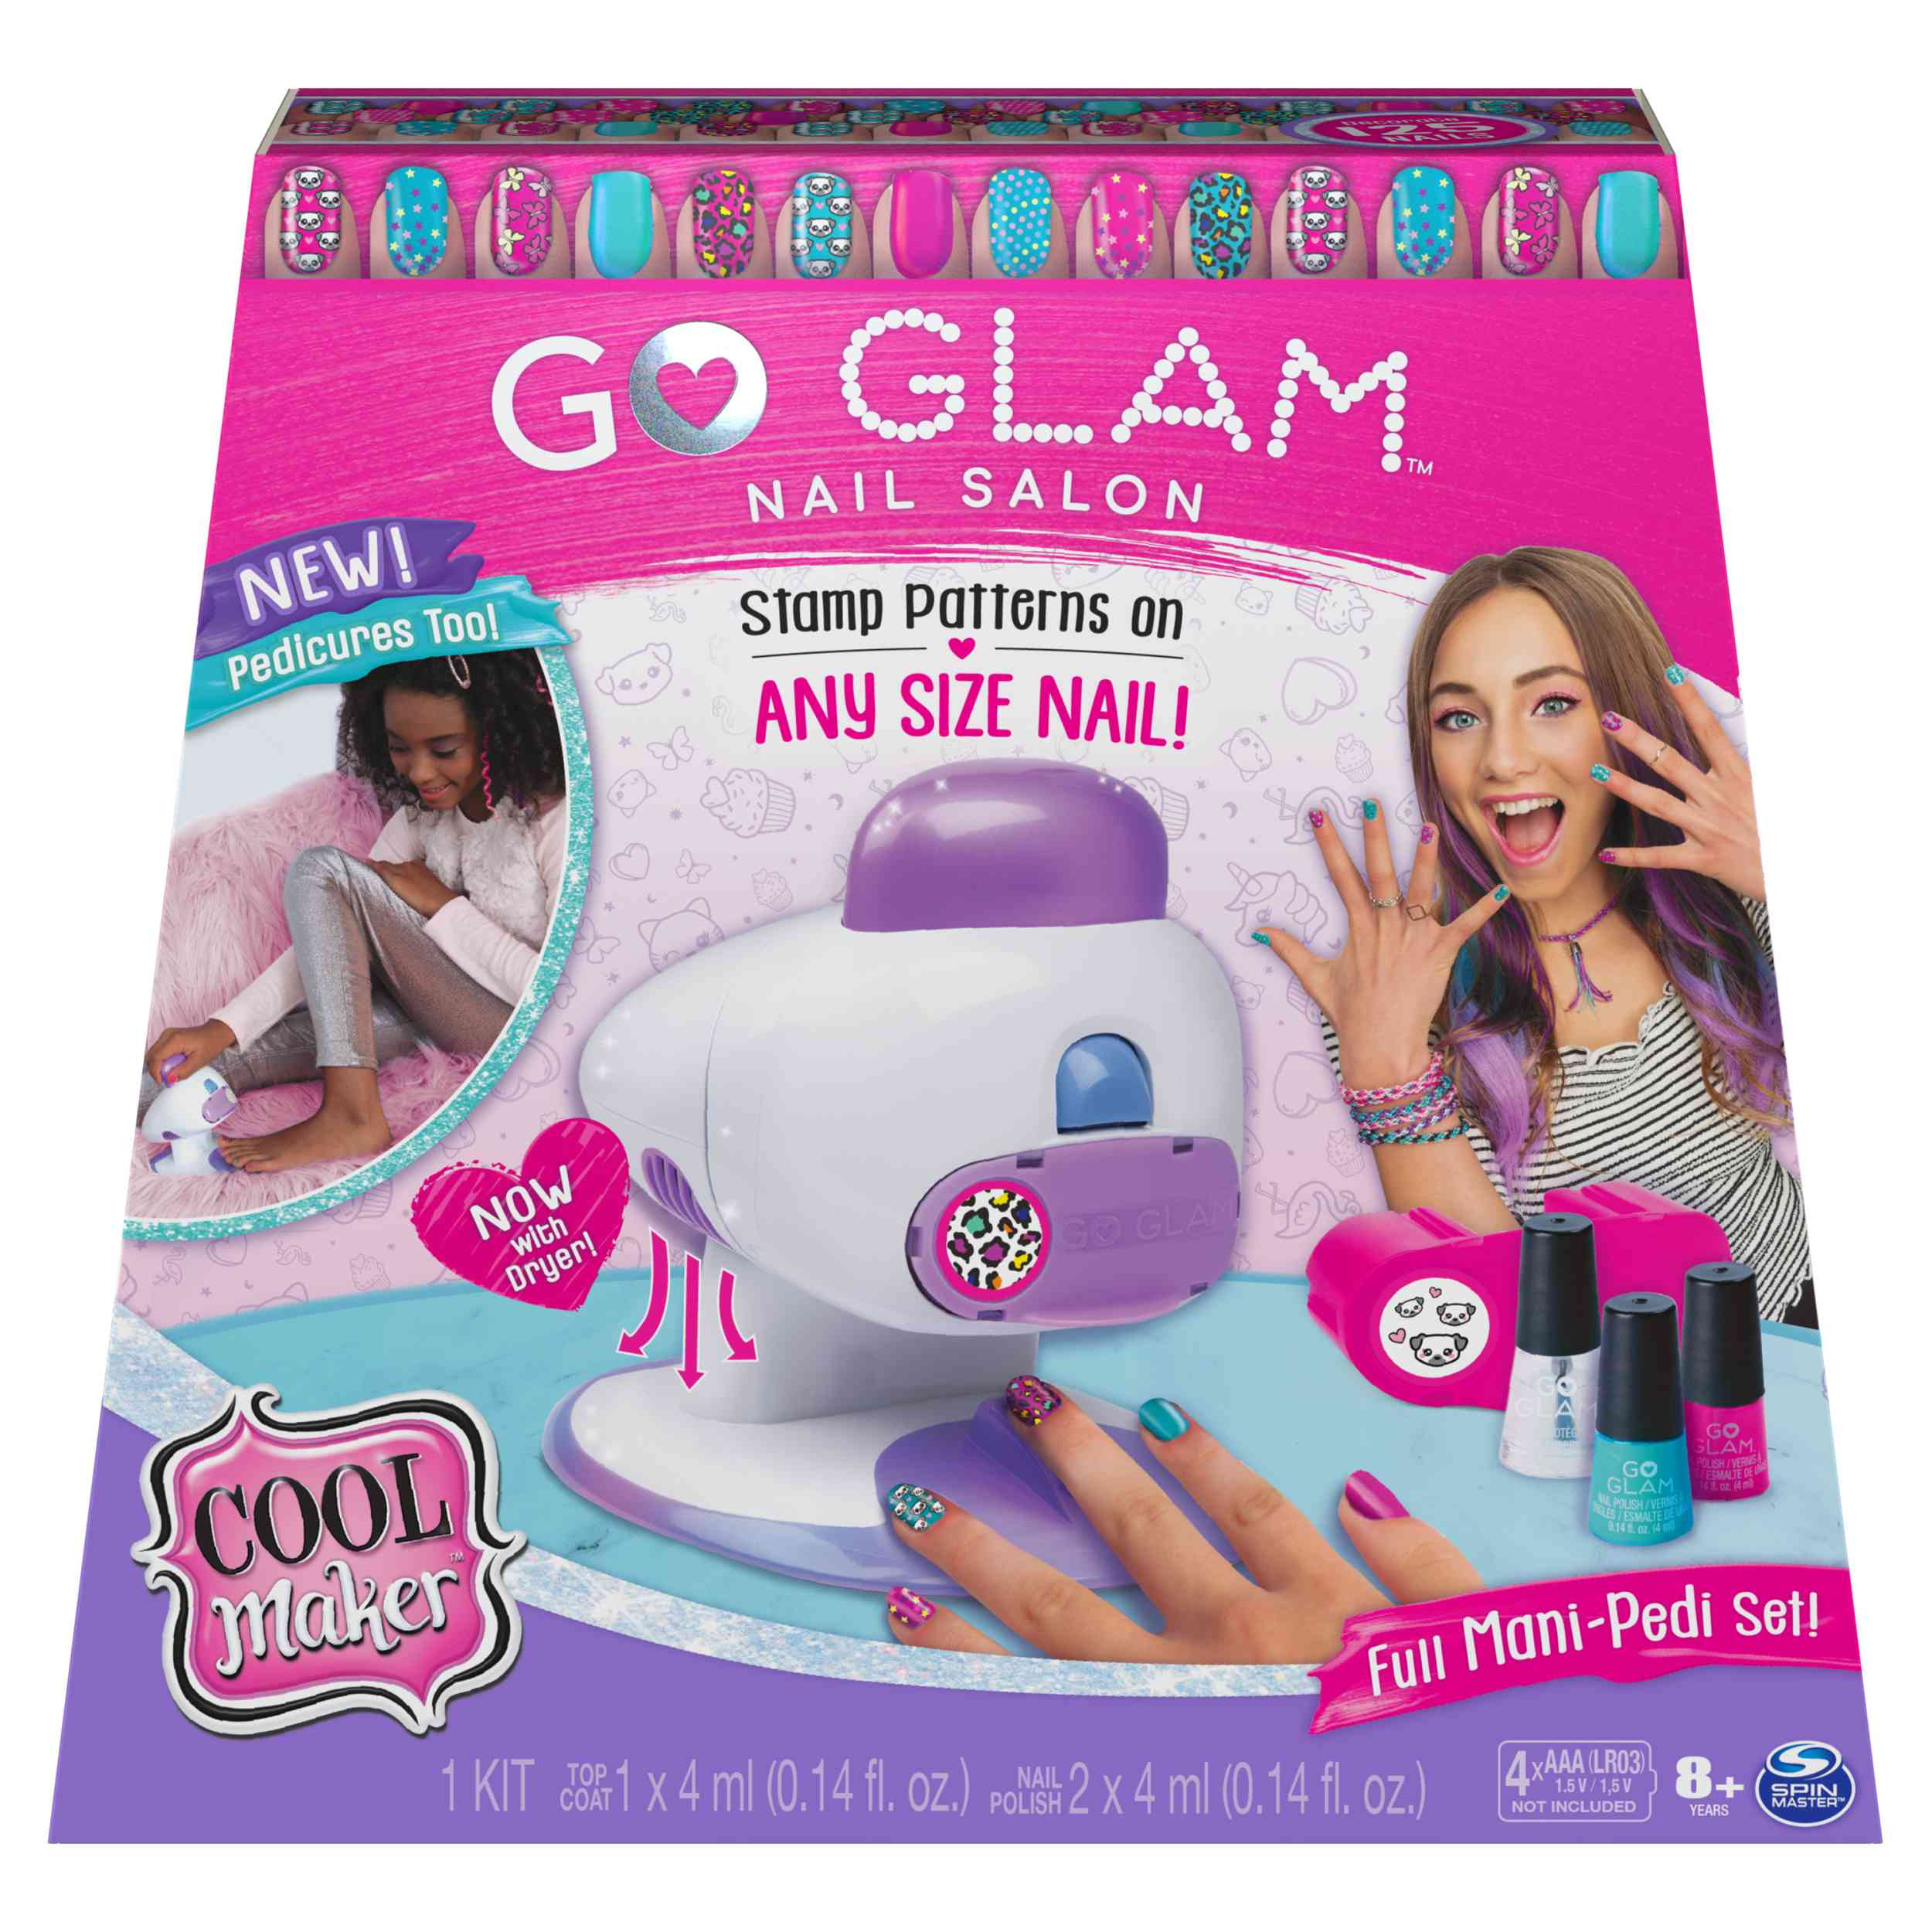 Go Glam Nail Salon